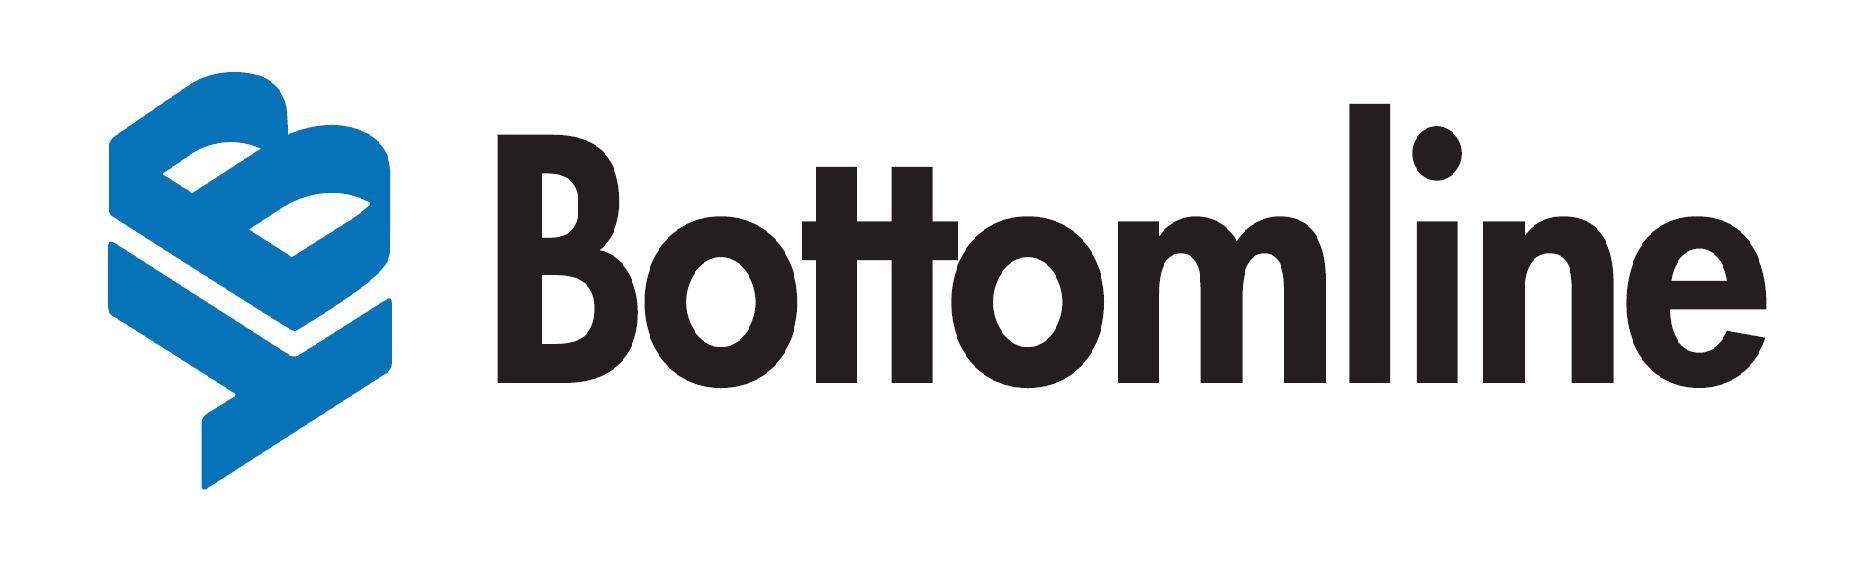 Bottomline-Horizontal-speakers